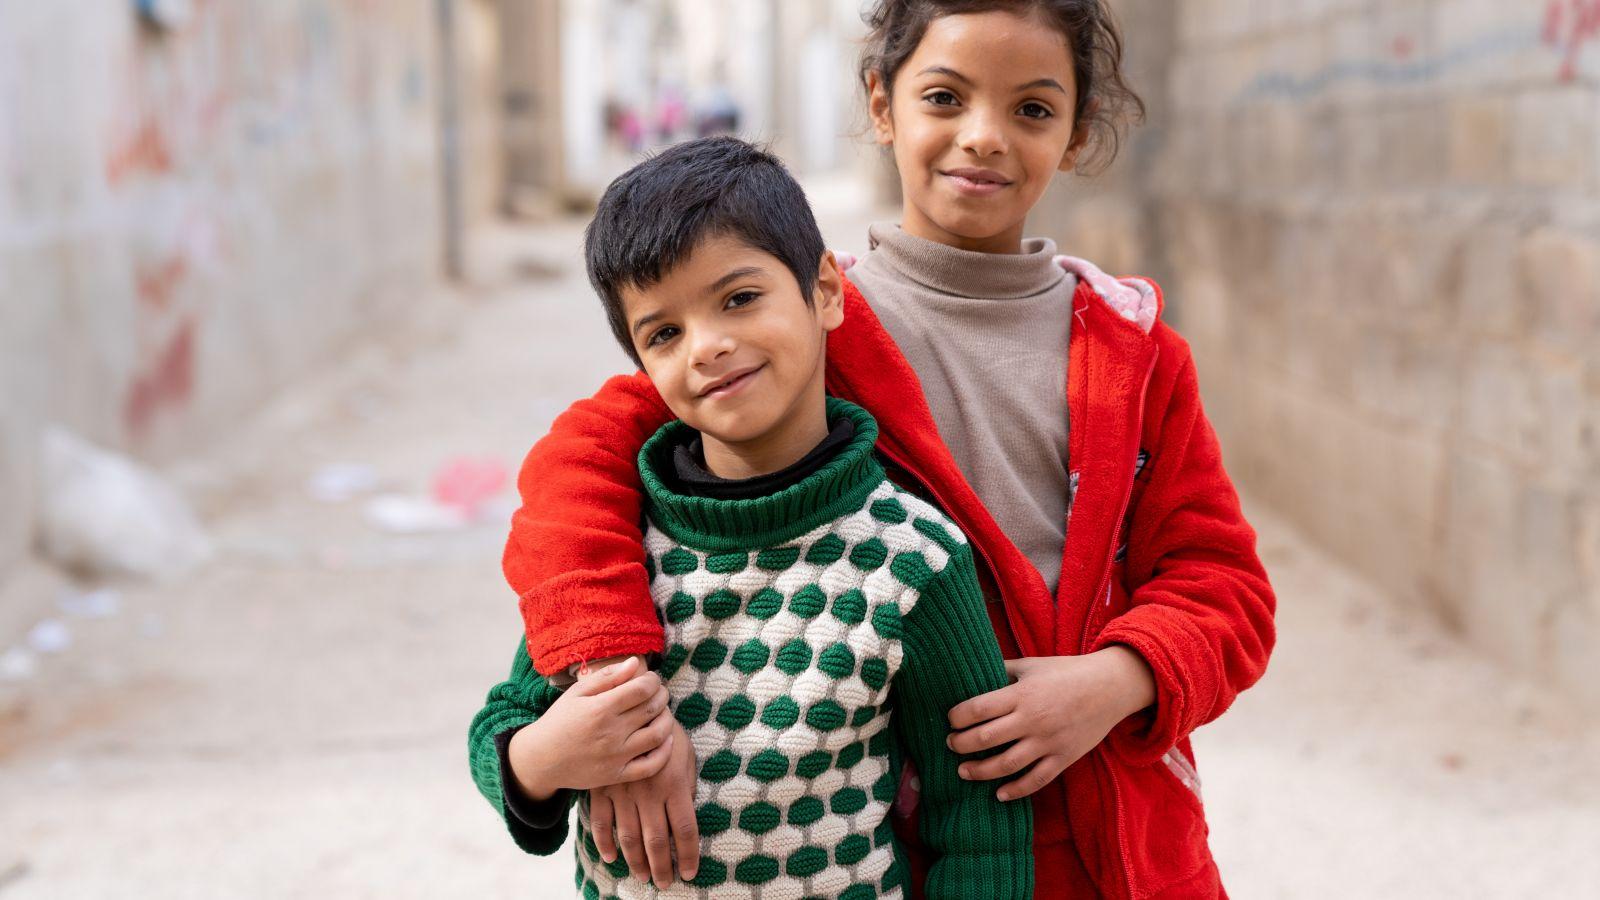 UNICEF/UN0278477/Herwig